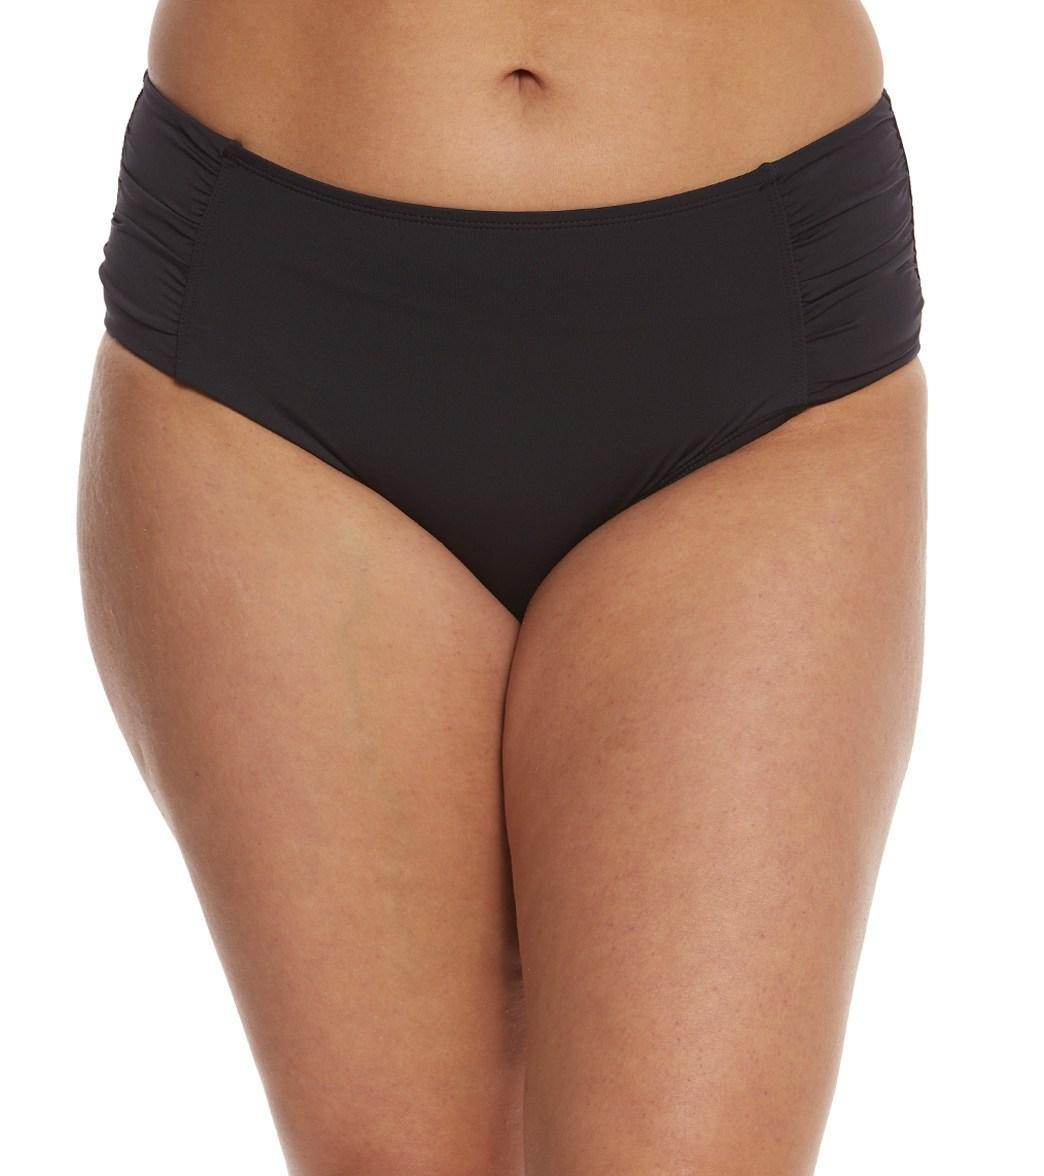 1a1ce0be71323 Tommy Bahama Plus Size Side Shirred High Waist Bikini Bottom at  SwimOutlet.com - Free Shipping